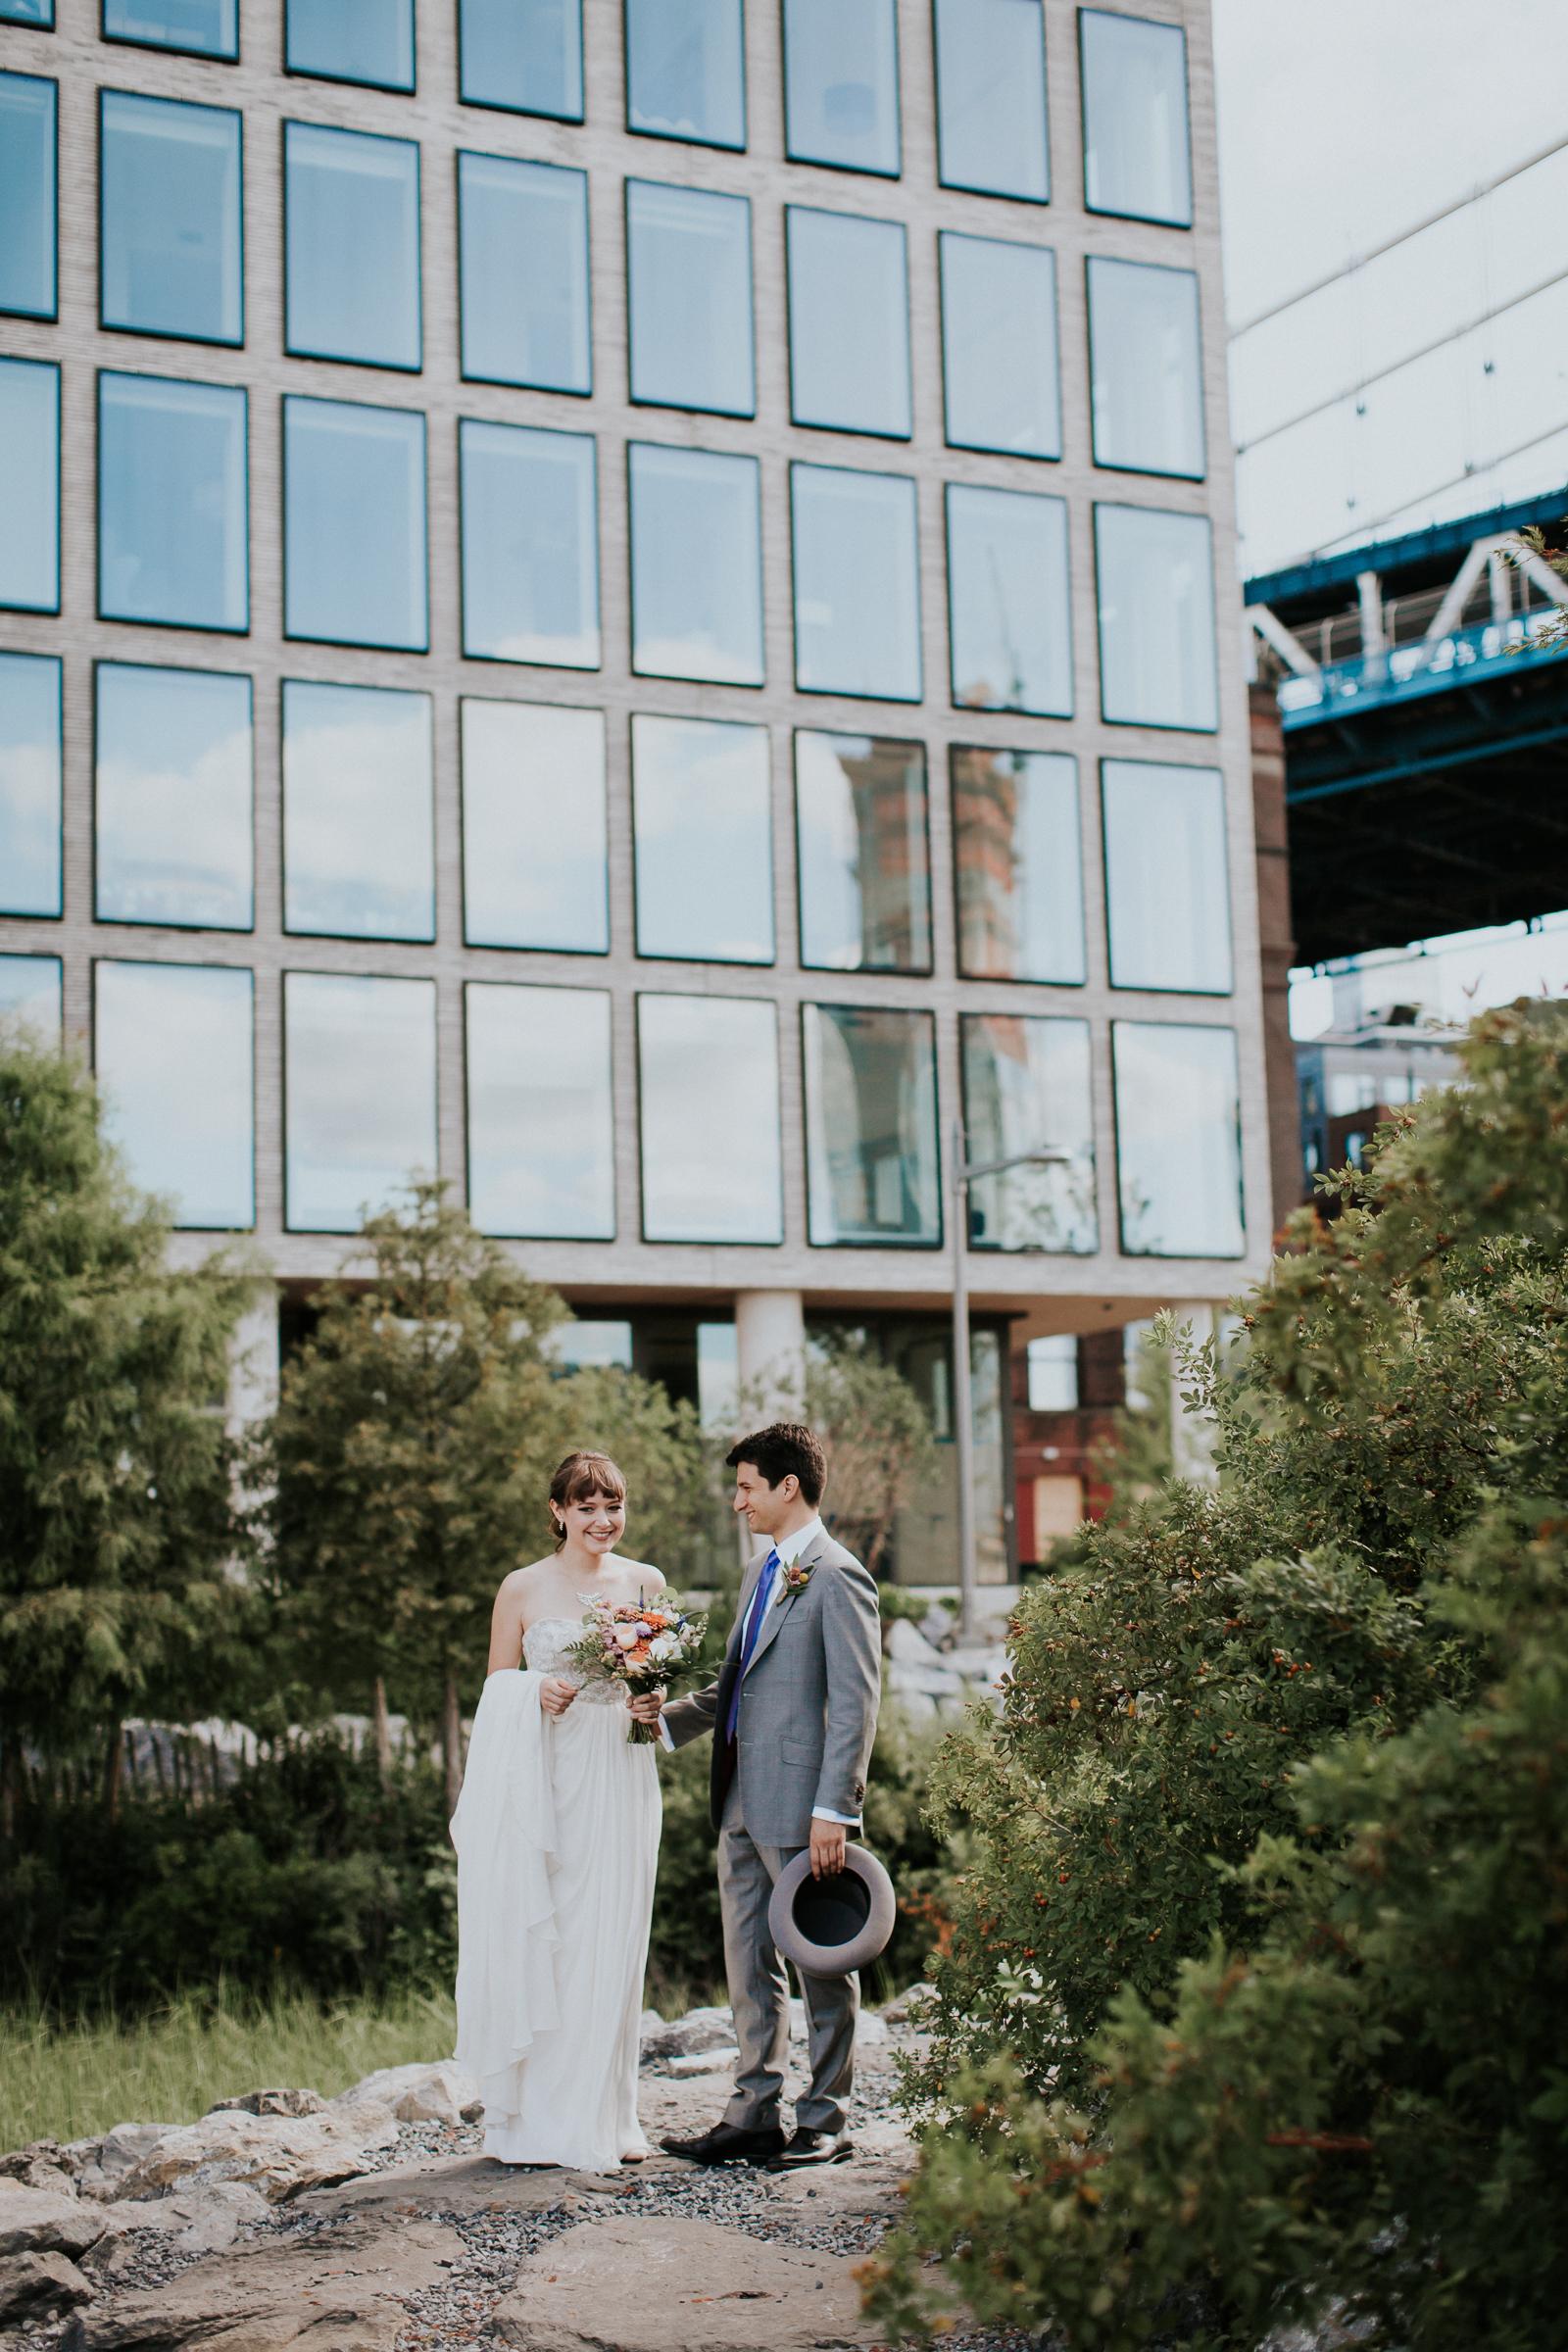 Dinosaur-Inspired-Brooklyn-Wedding-26-Bridge-New-York-Documentary-Wedding-Photographer-26.jpg